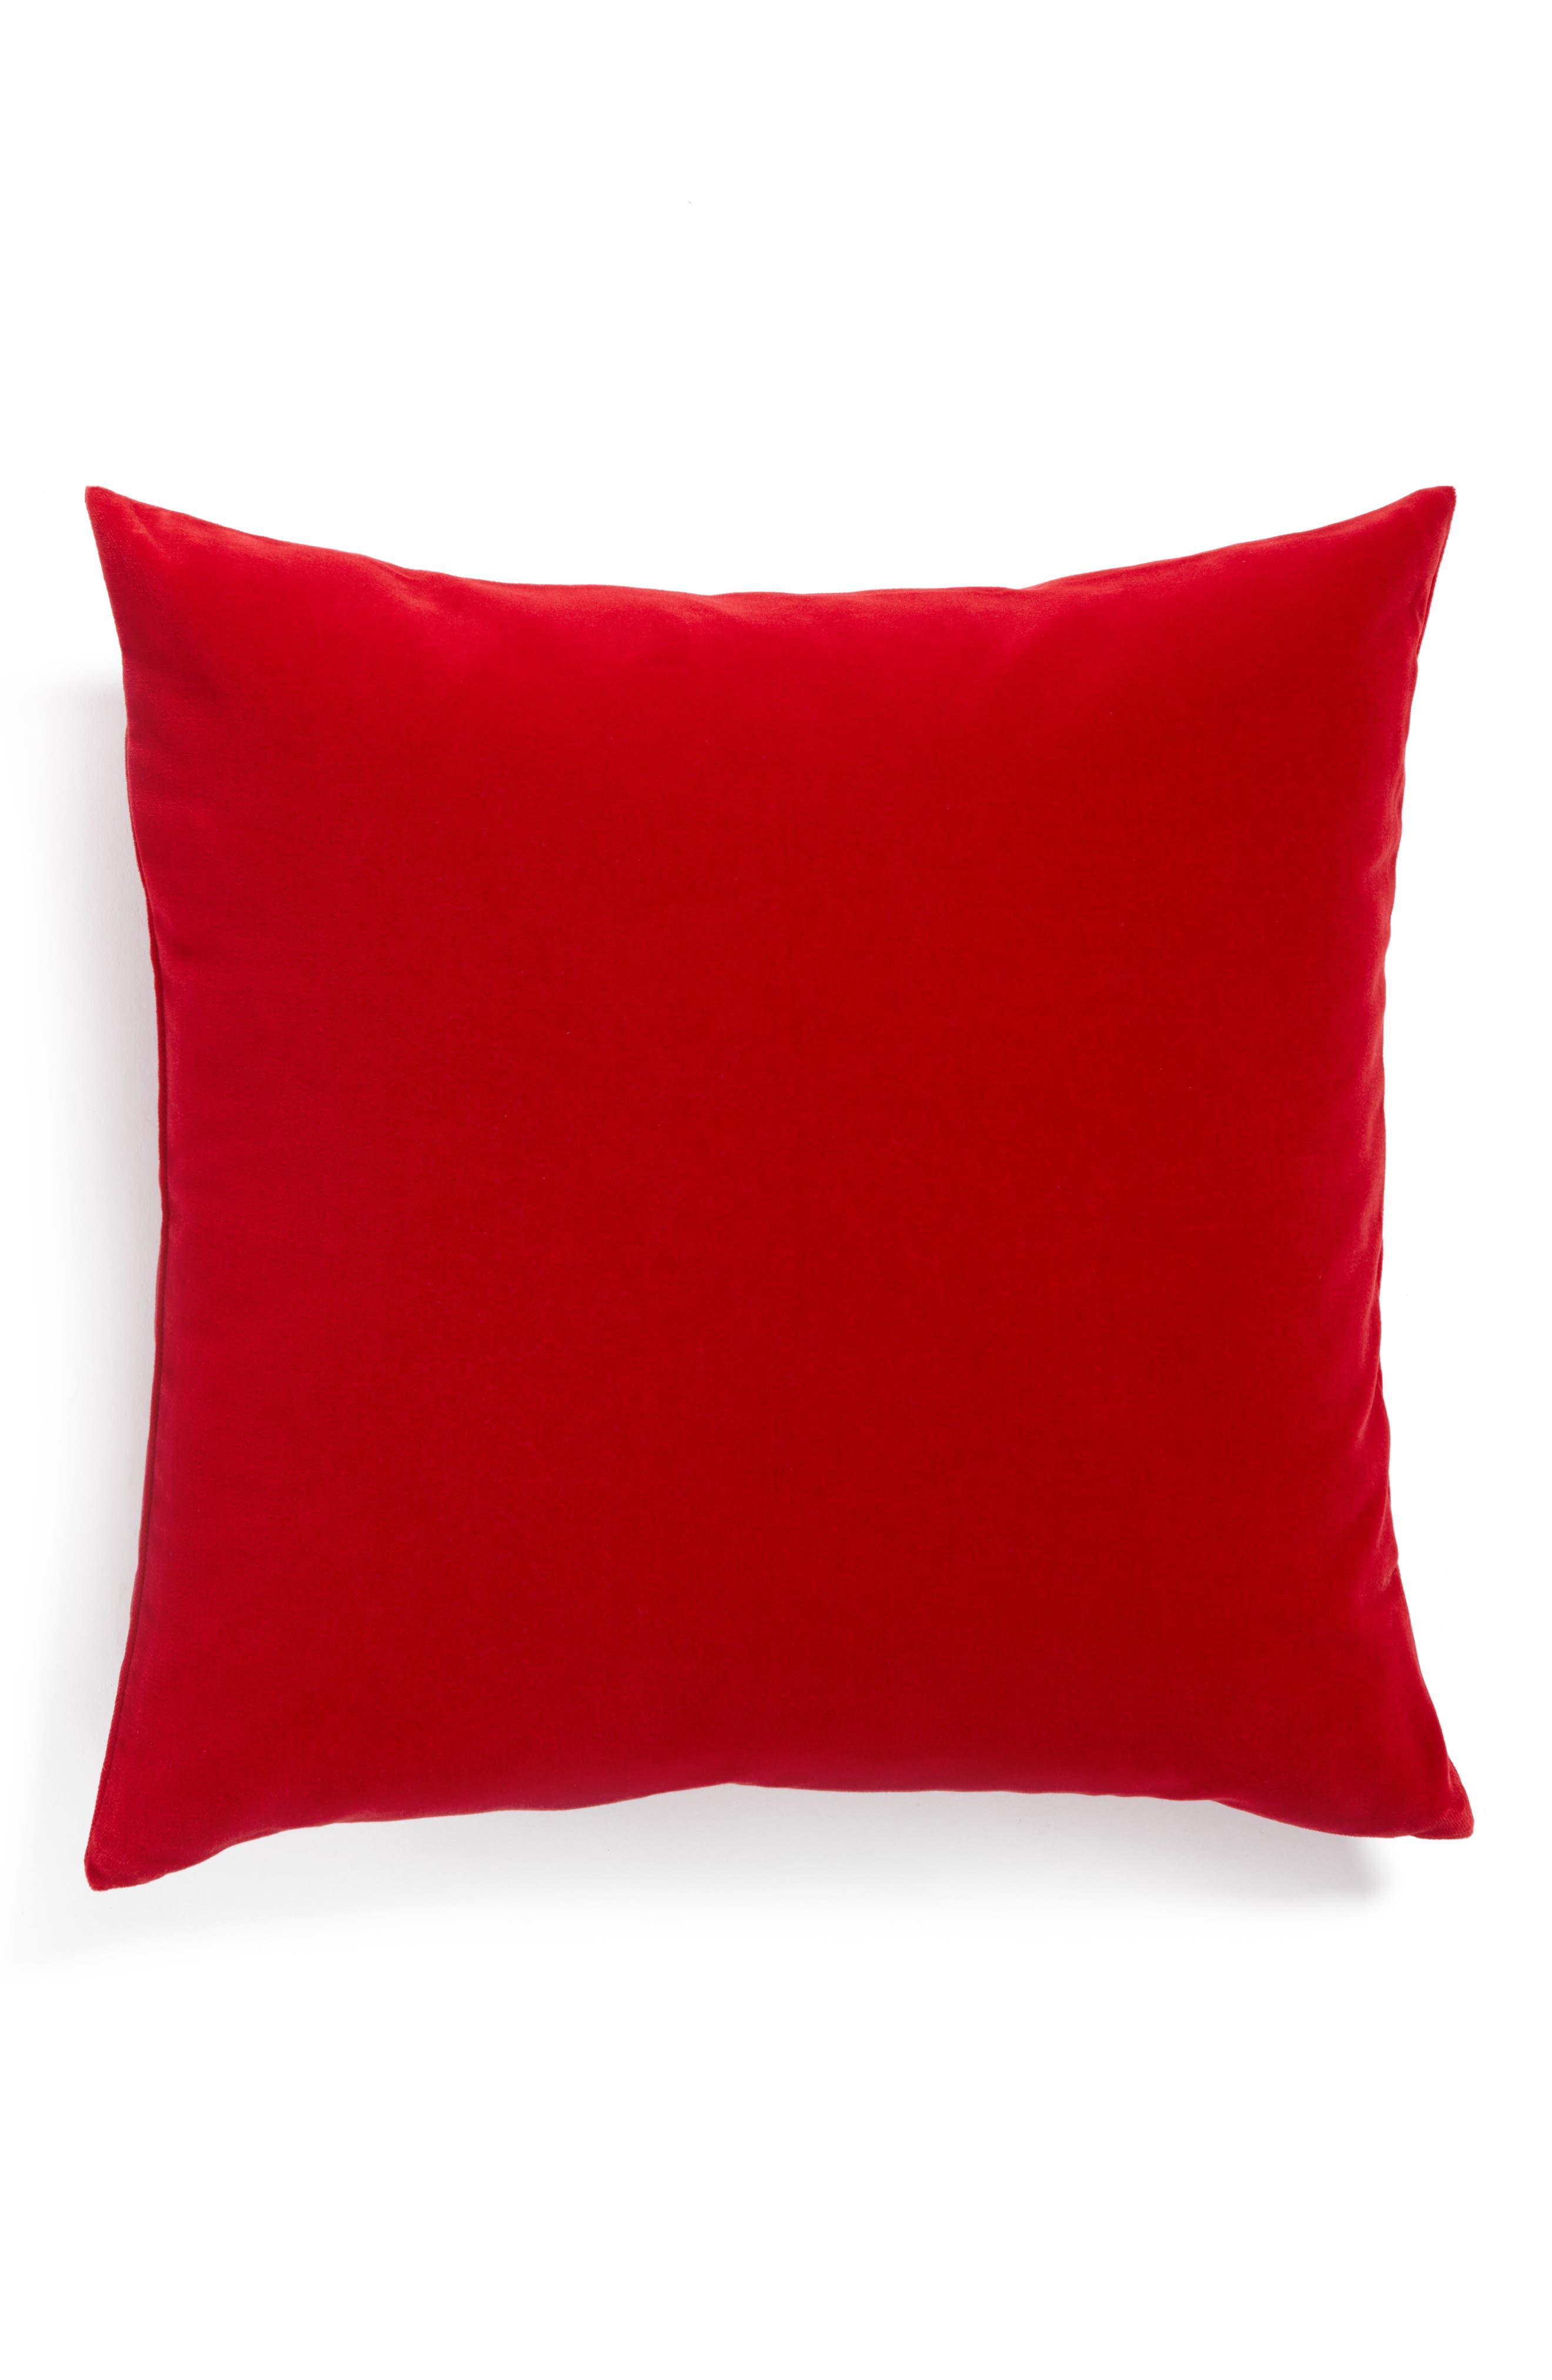 Lucerne Velvet Pillow,                             Main thumbnail 1, color,                             Oxblood